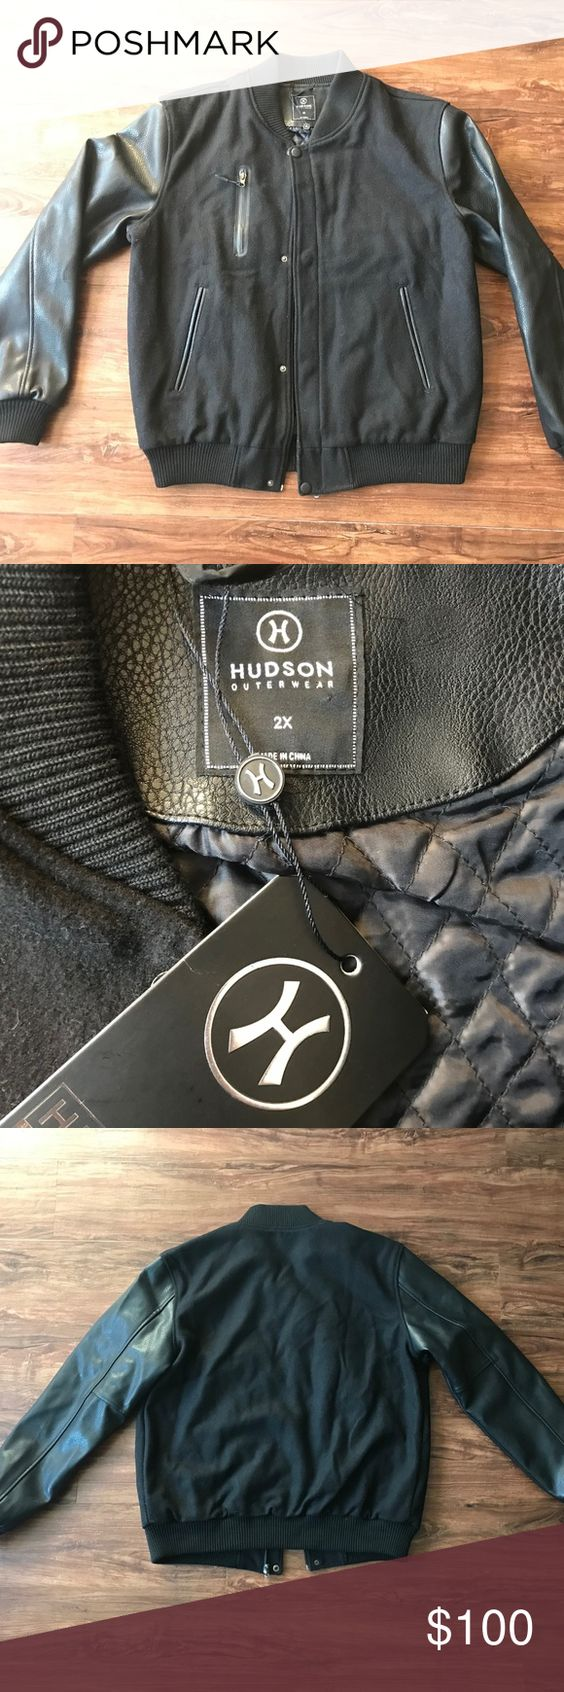 Hudson Outerwear Black Lettermen Jacket Size Xxl Black Letterman Jacket Letterman Jacket Jackets [ 1692 x 564 Pixel ]